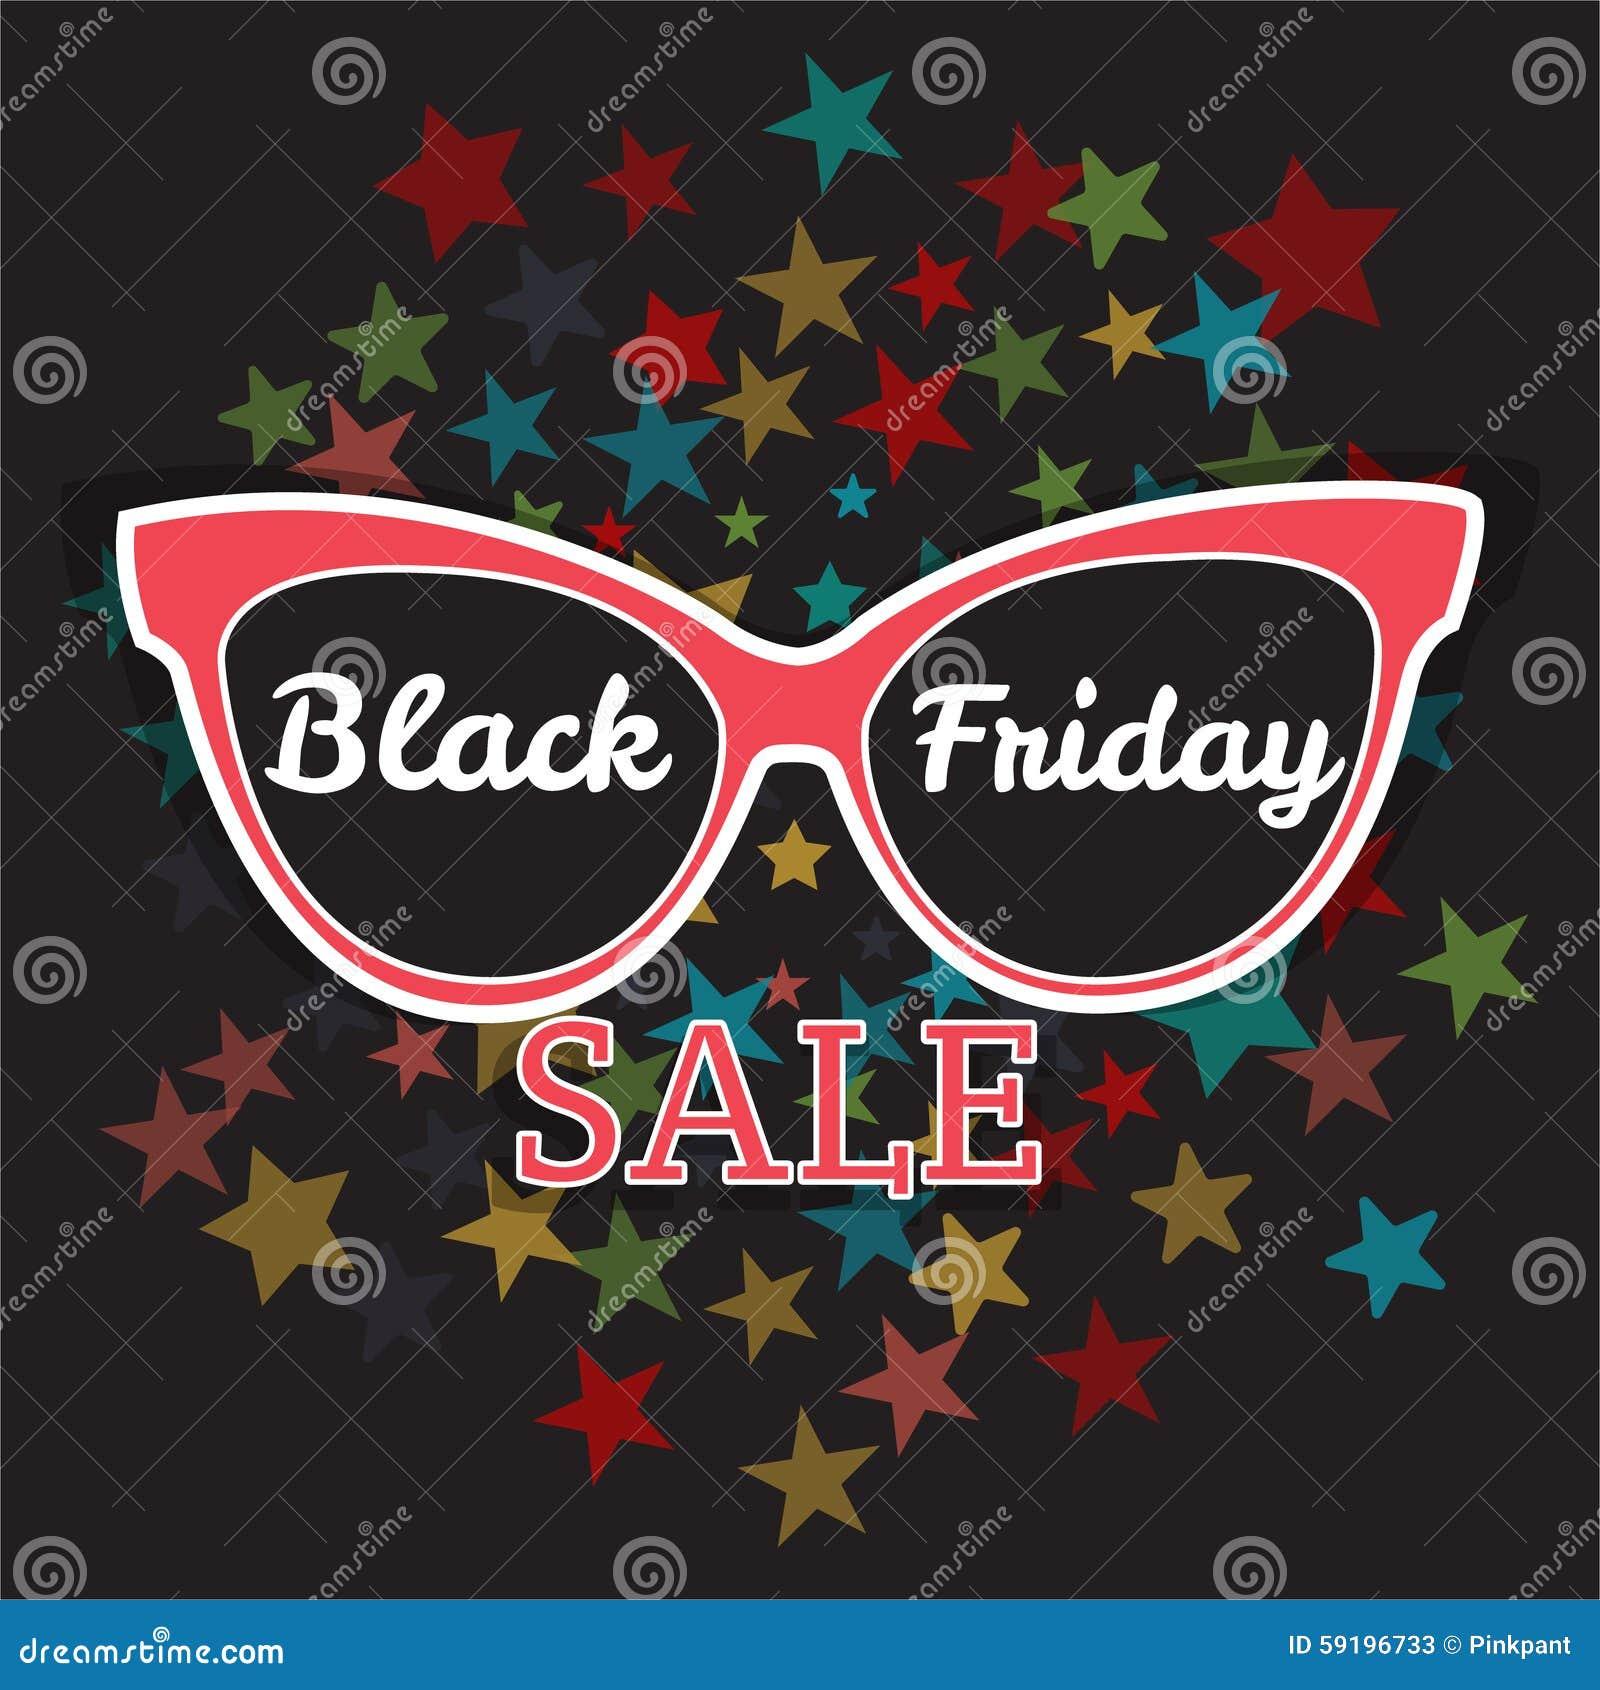 vector sale poster advertising black friday  sunglasses black friday sale  stock illustration